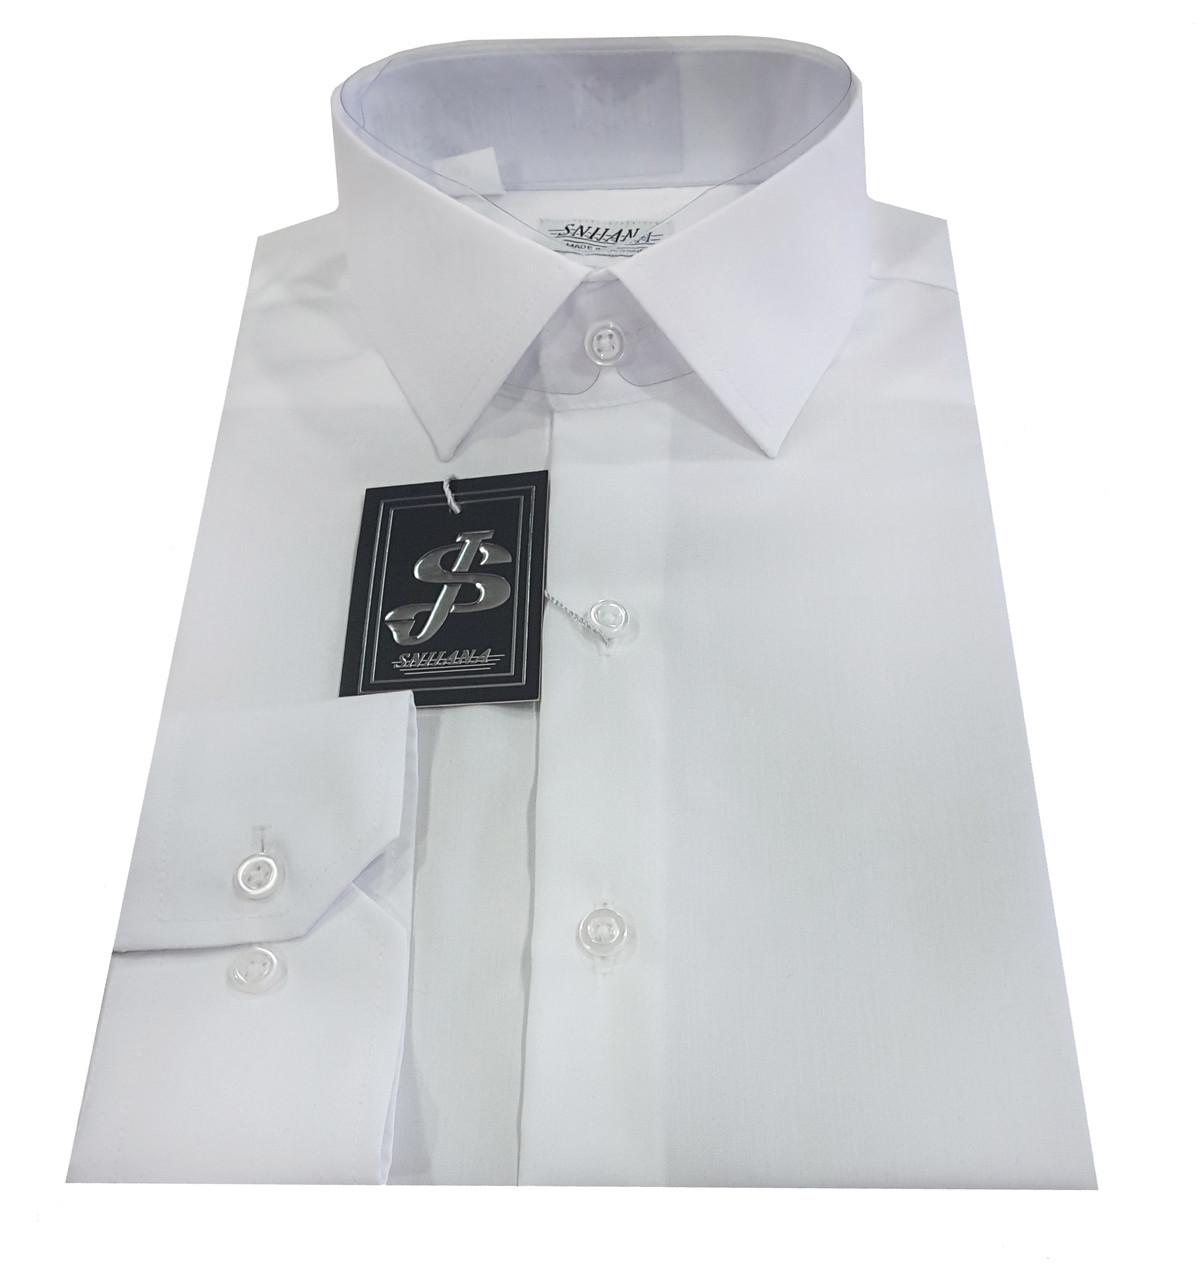 Рубашка мужская белая №10-12к.- Non Iron